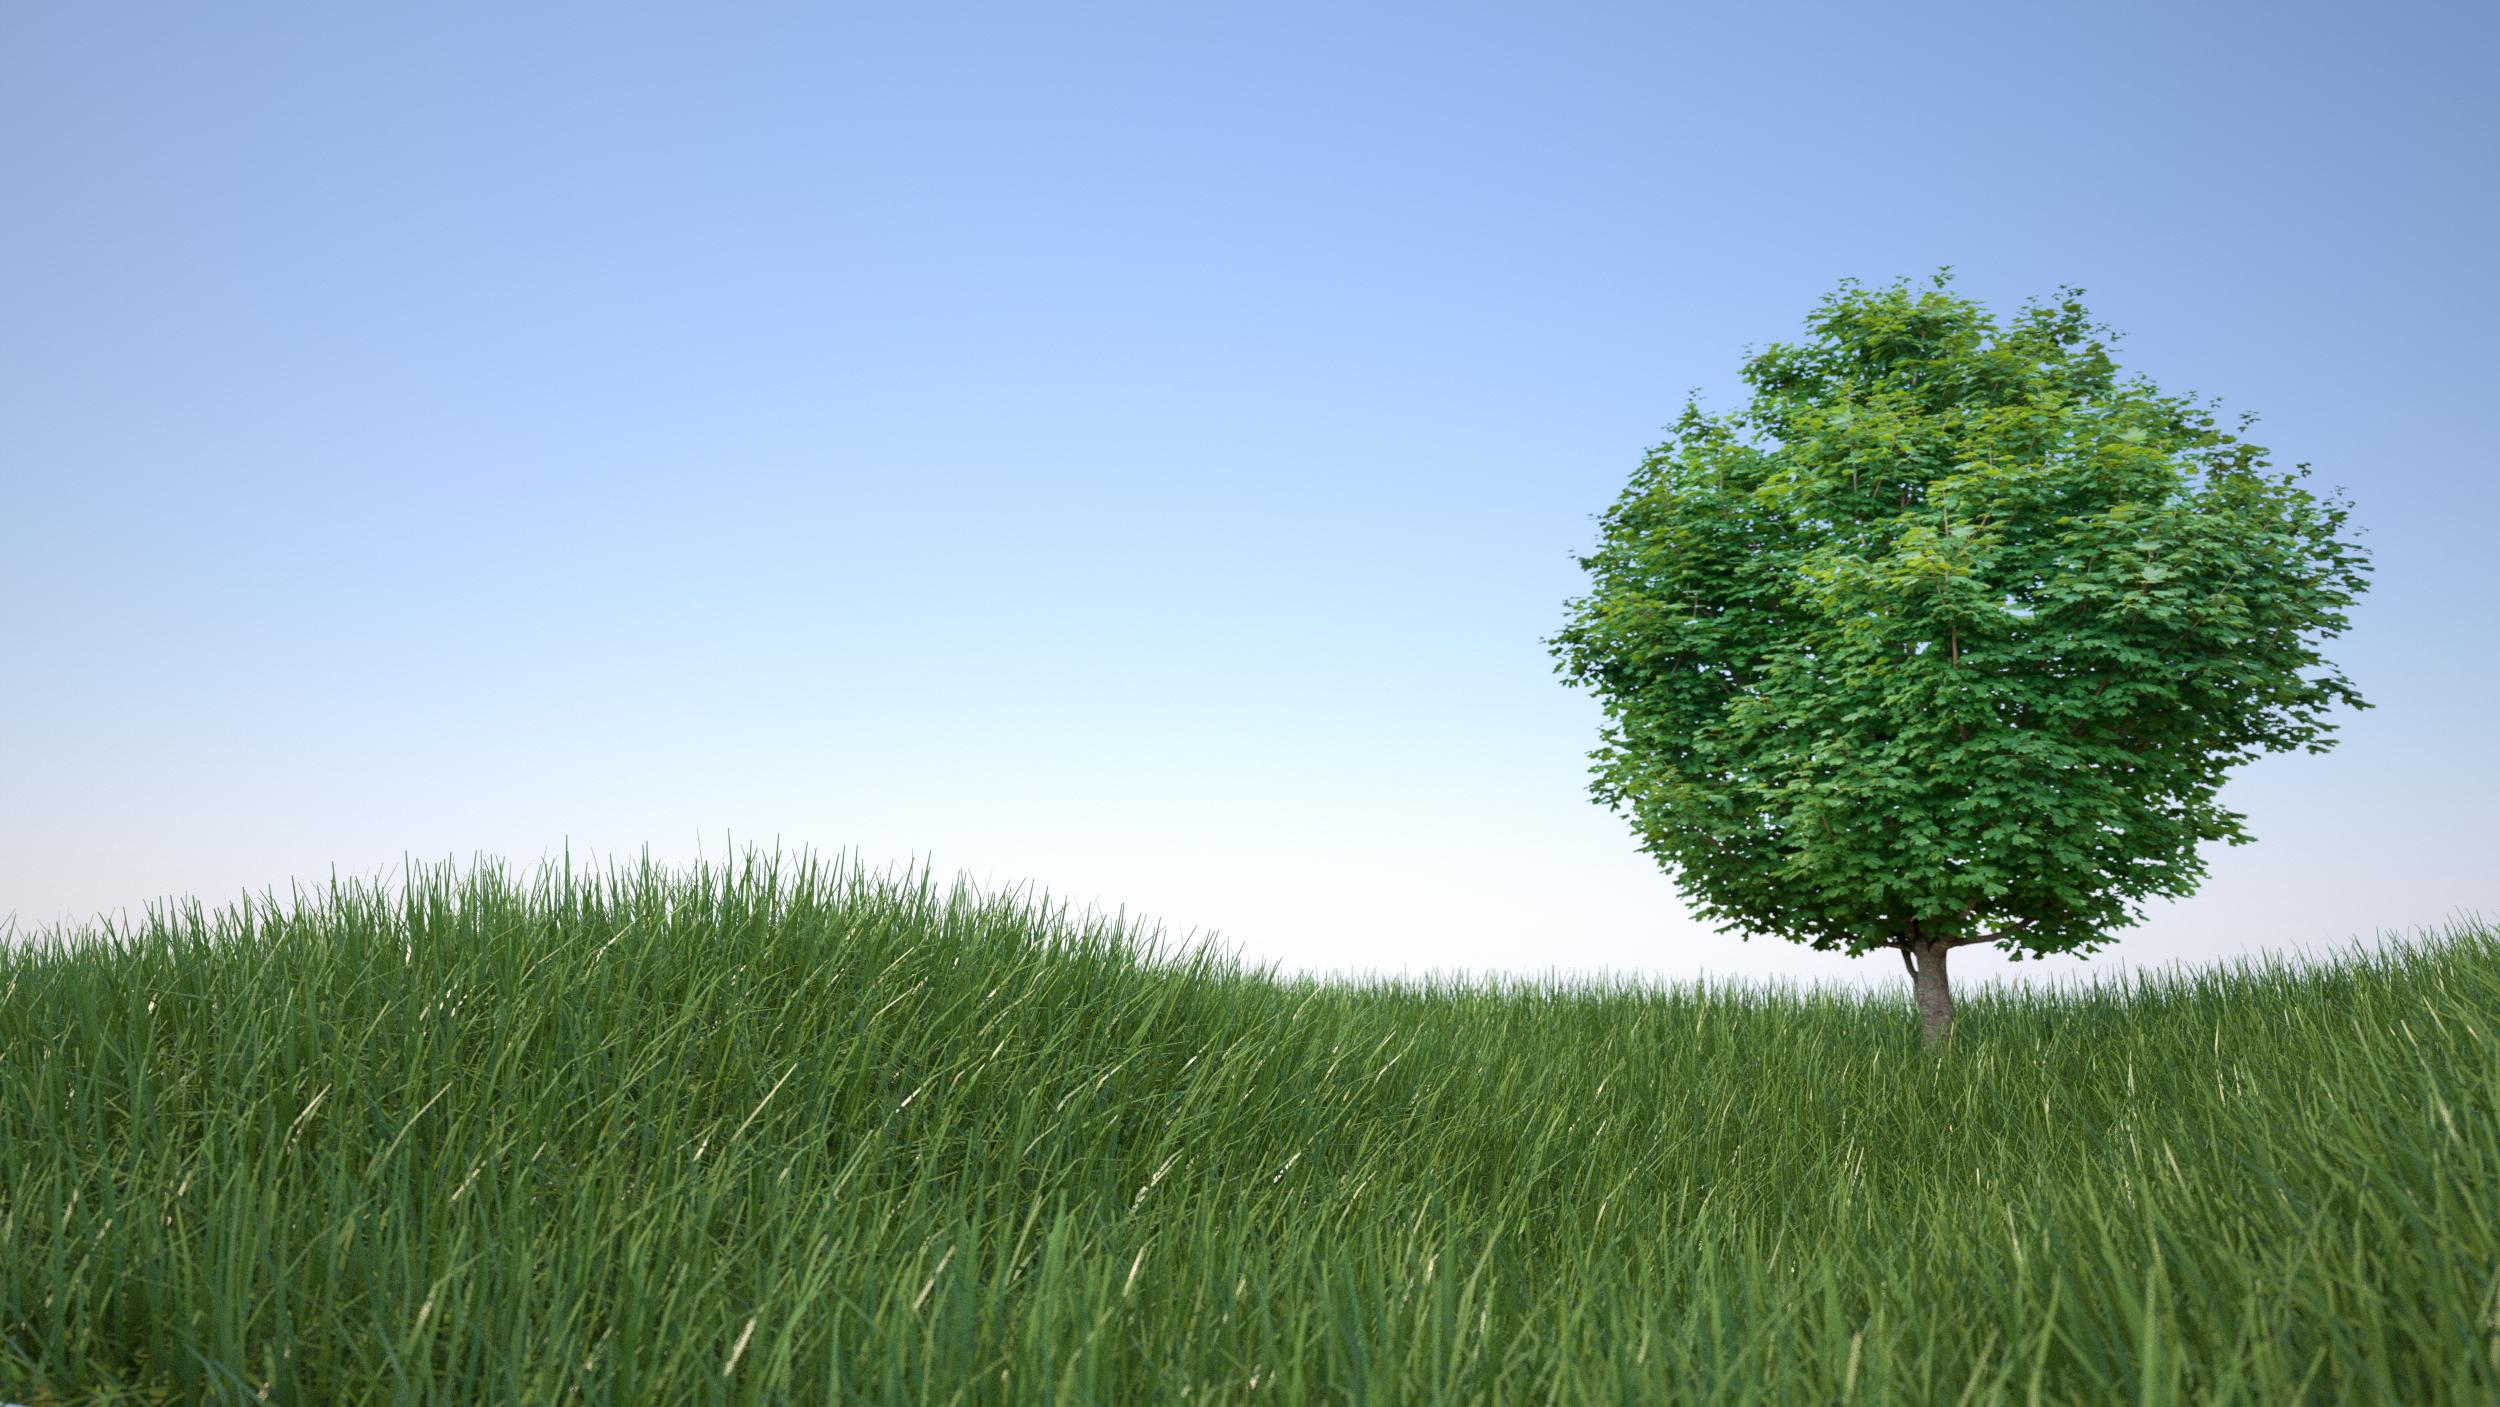 Overgrown Lawn